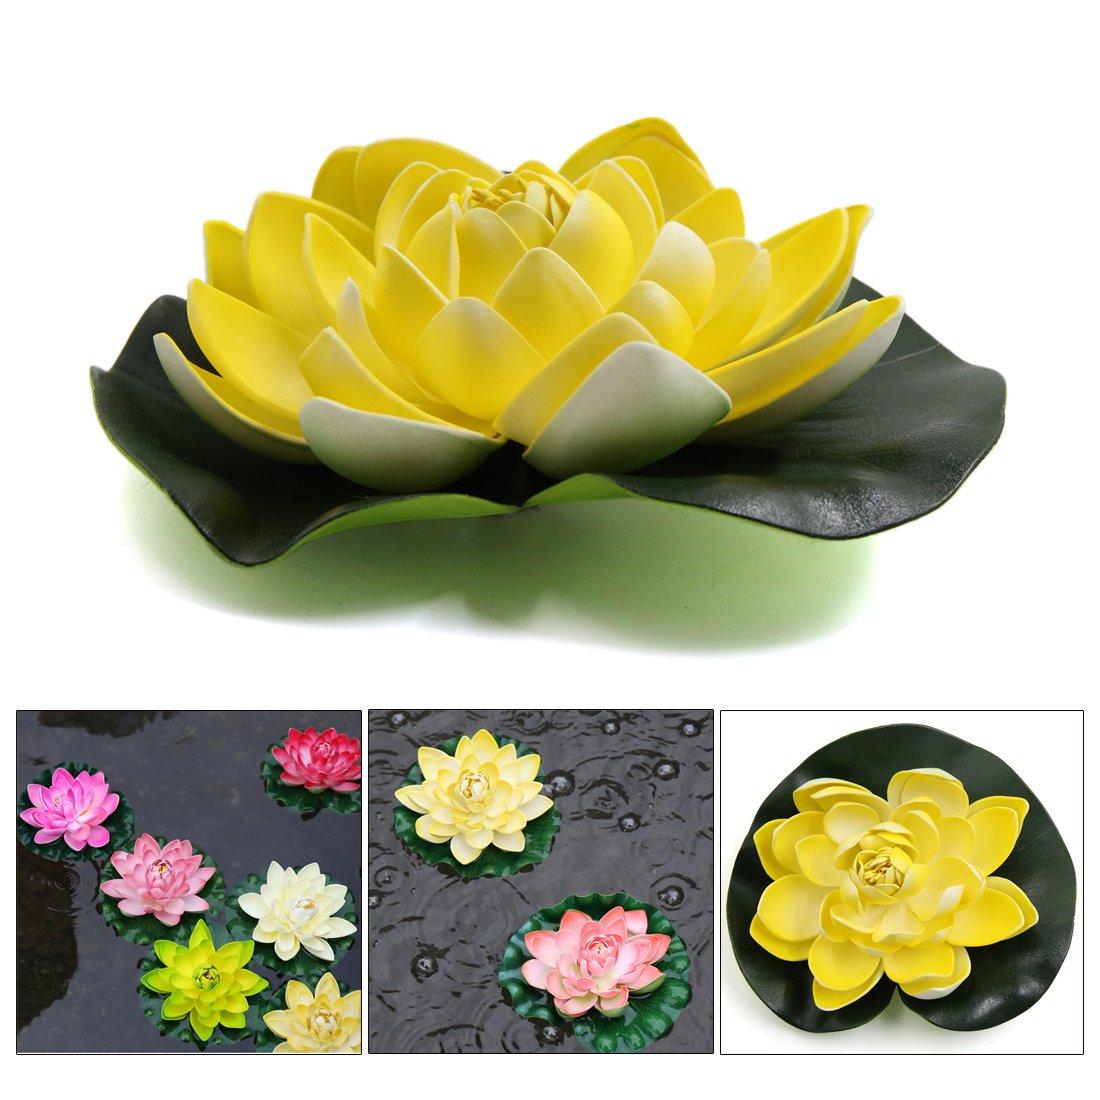 Uxcell Yellow Foam Lotus Flower Aquarium Pond Decor Floating Plant